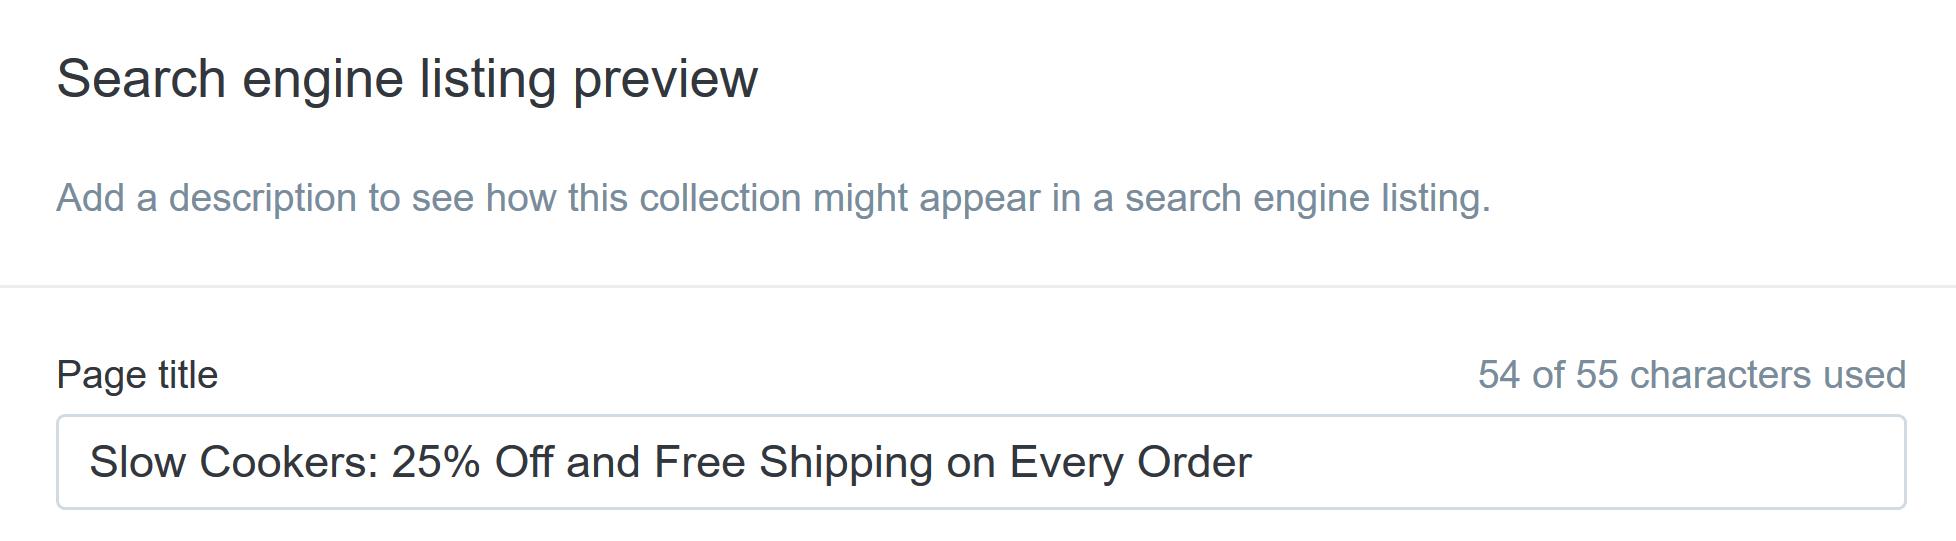 motor de búsqueda listado de vista previa 2